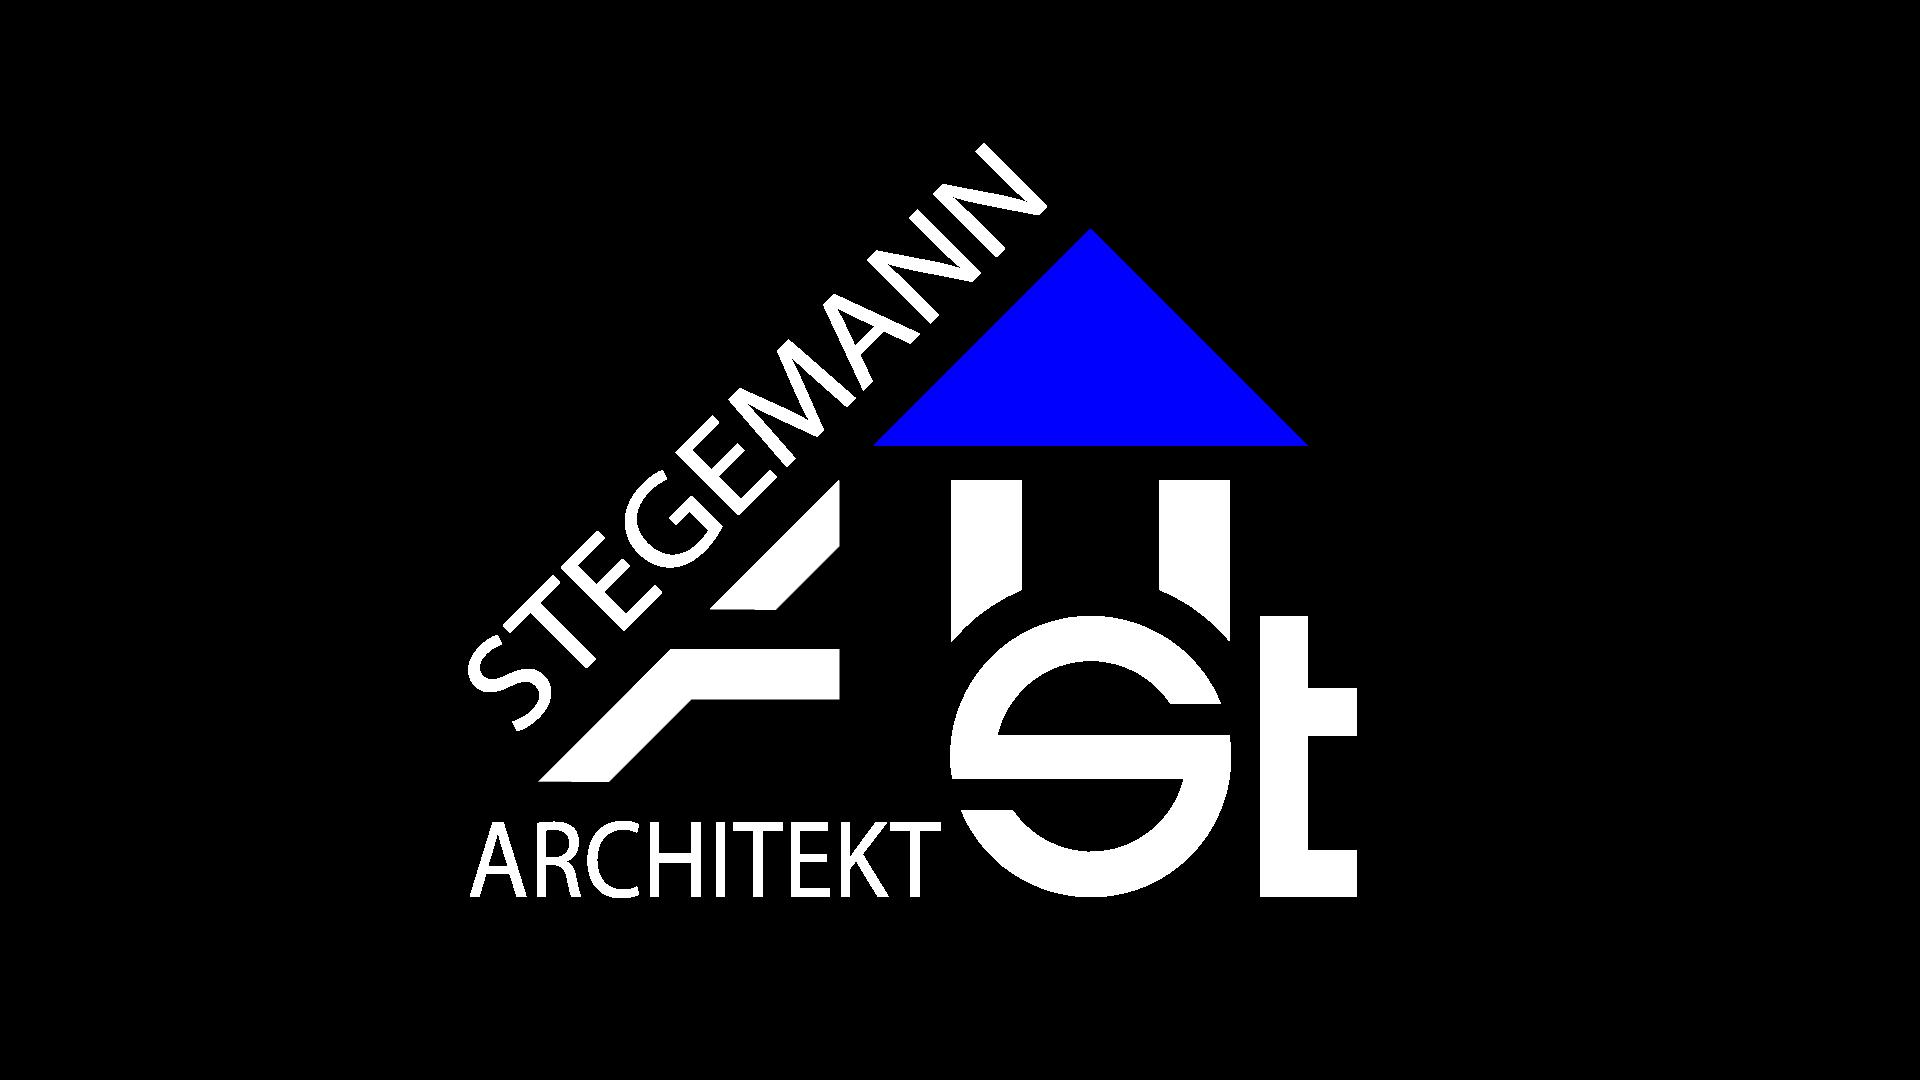 stegemann_logo_1920